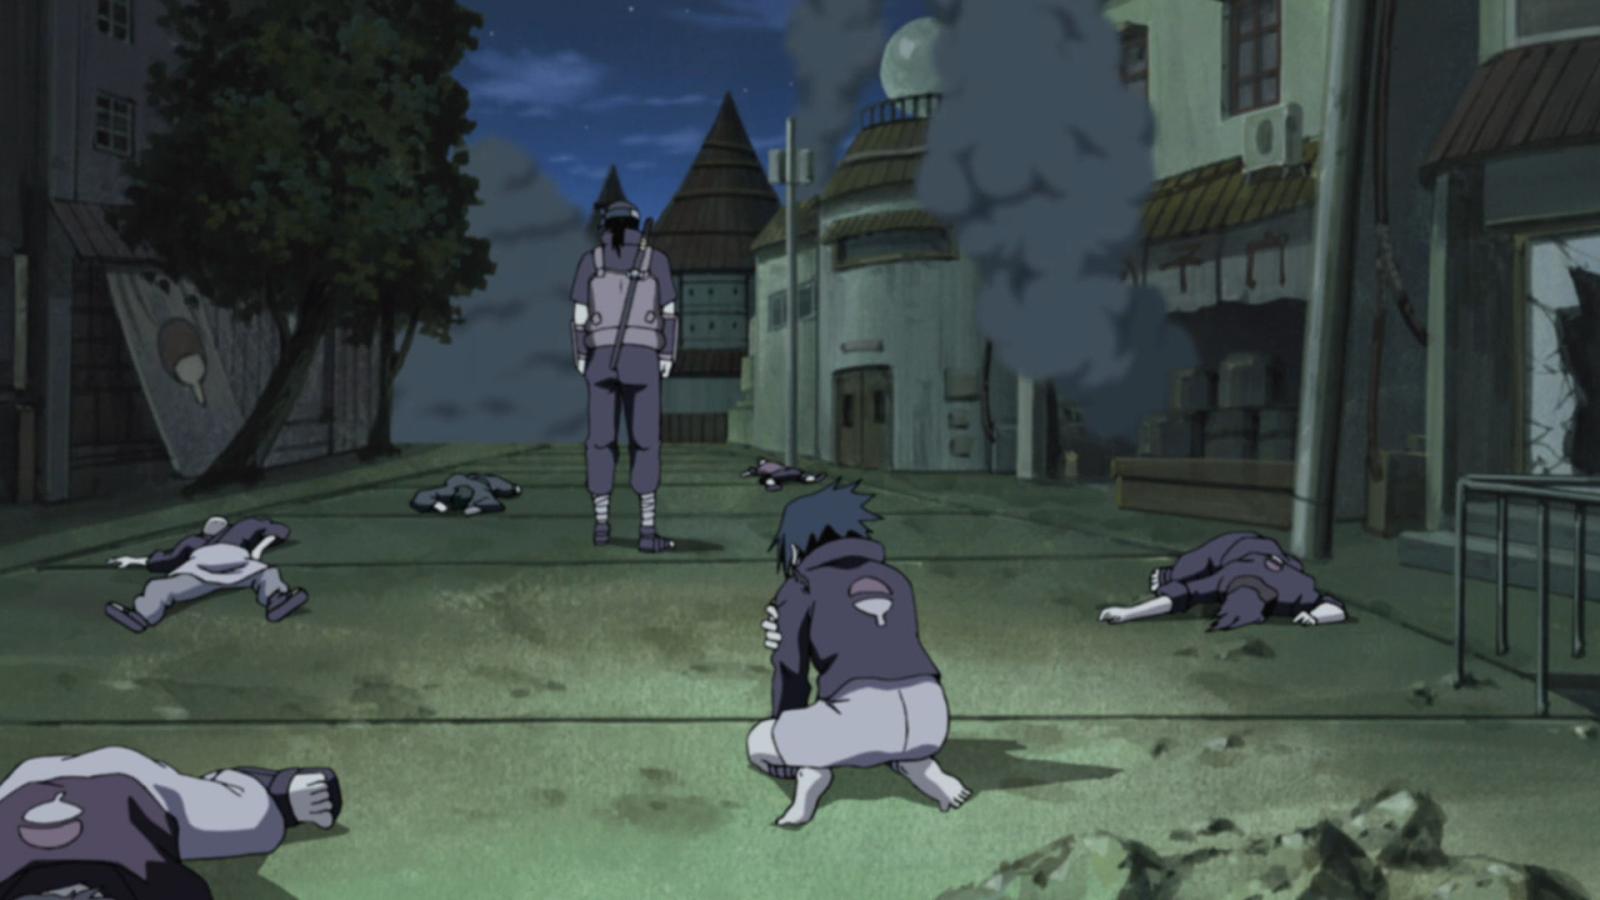 Gambar pembantaian uchiha